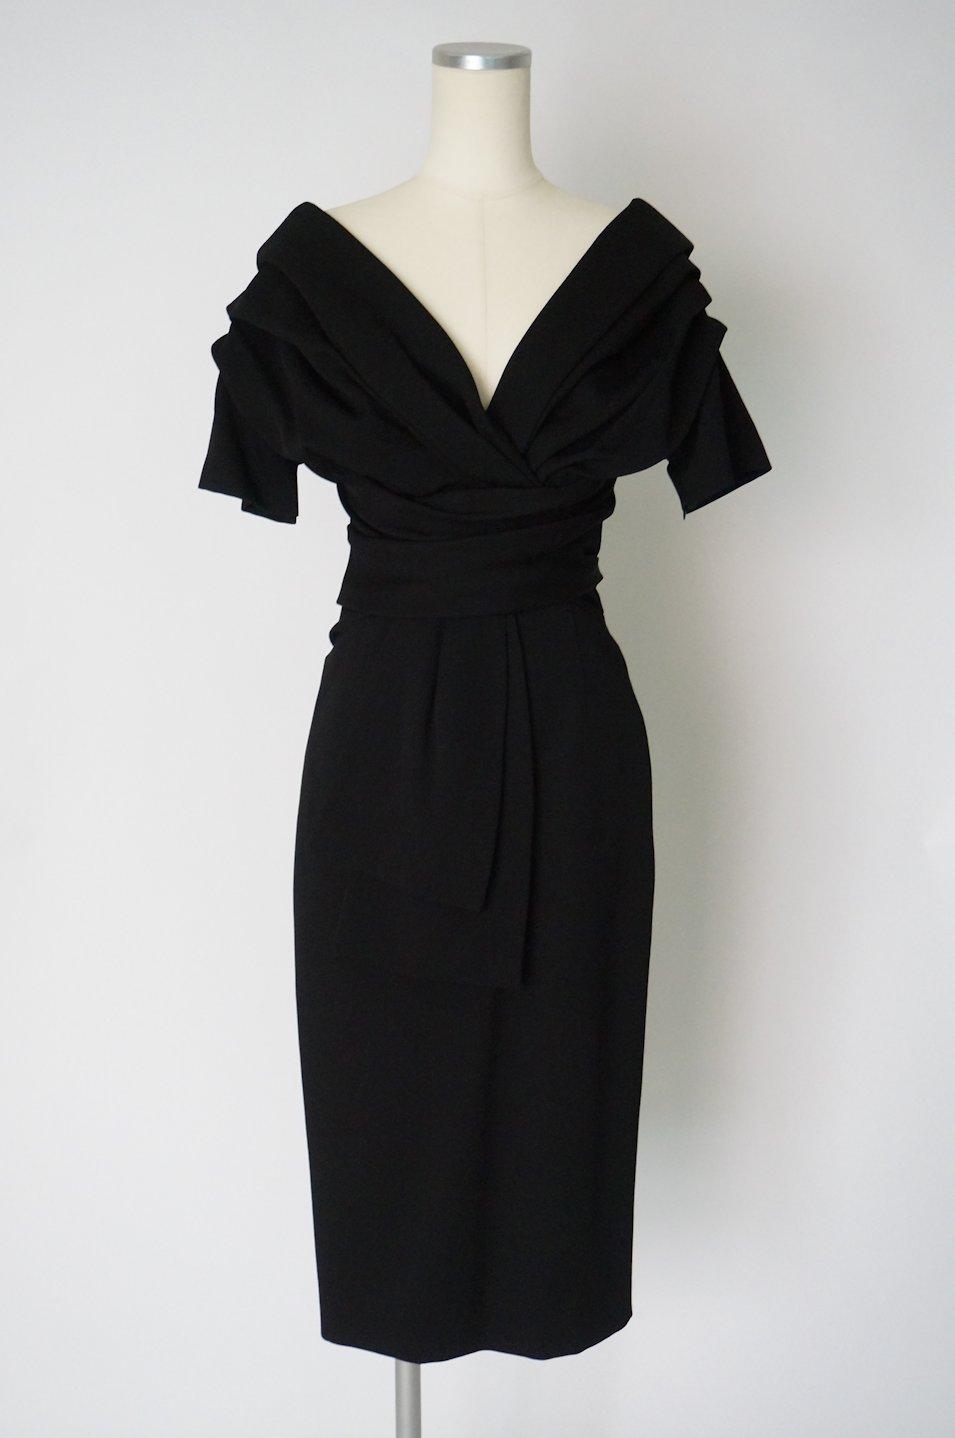 promo code 7090d 24b8a Dior / レンタルリトルブラックドレス テン Rental Little Black ...